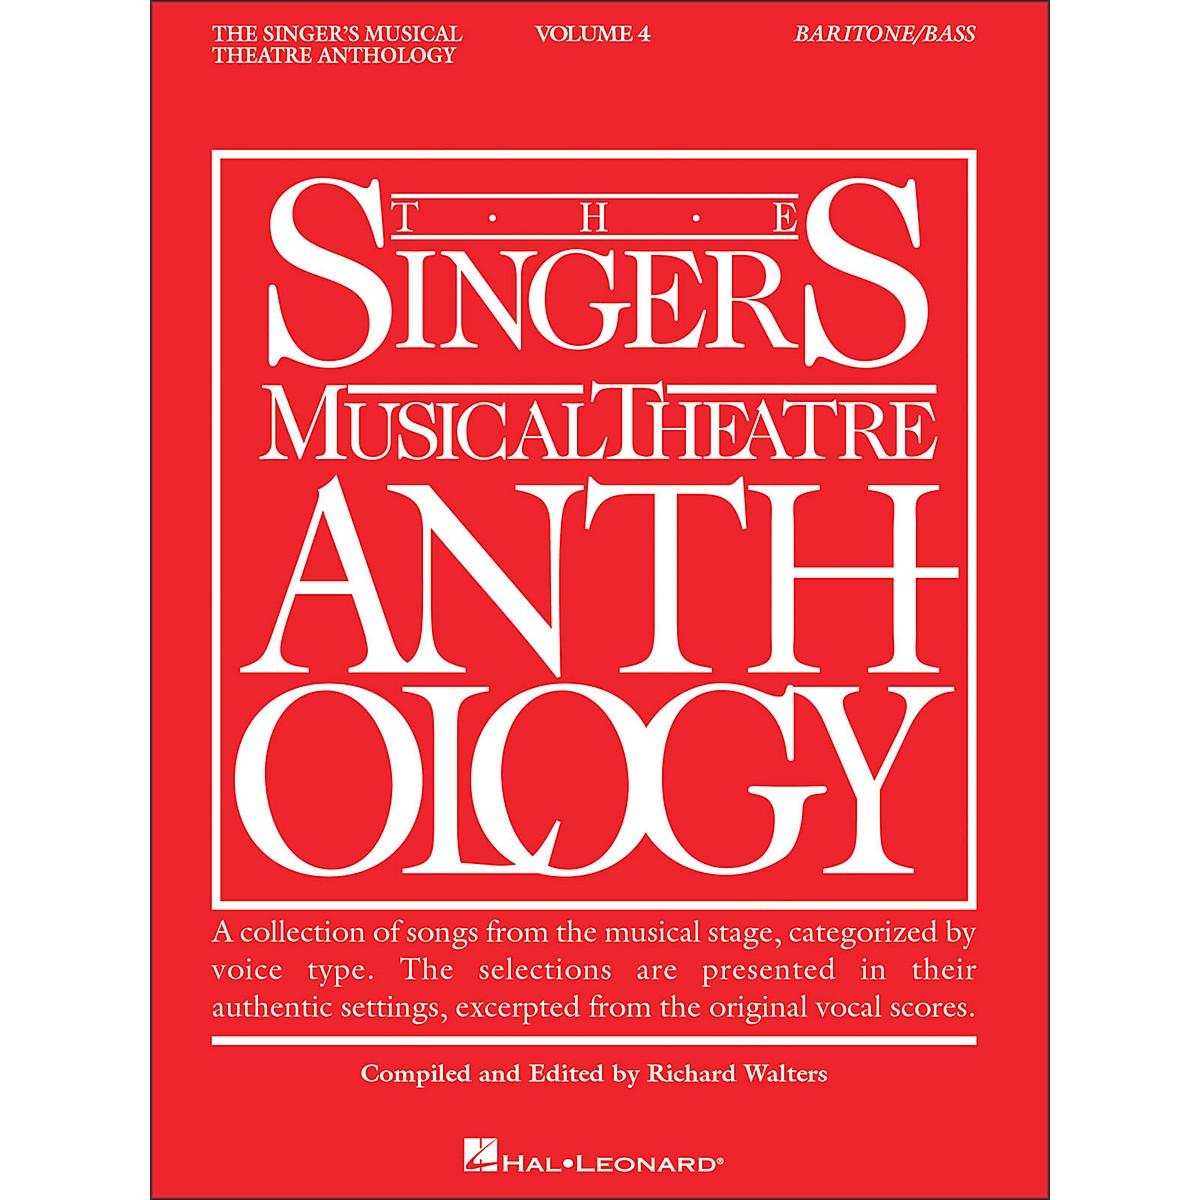 Hal Leonard Singer's Musical Theatre Anthology Baritone / Bass Volume 4